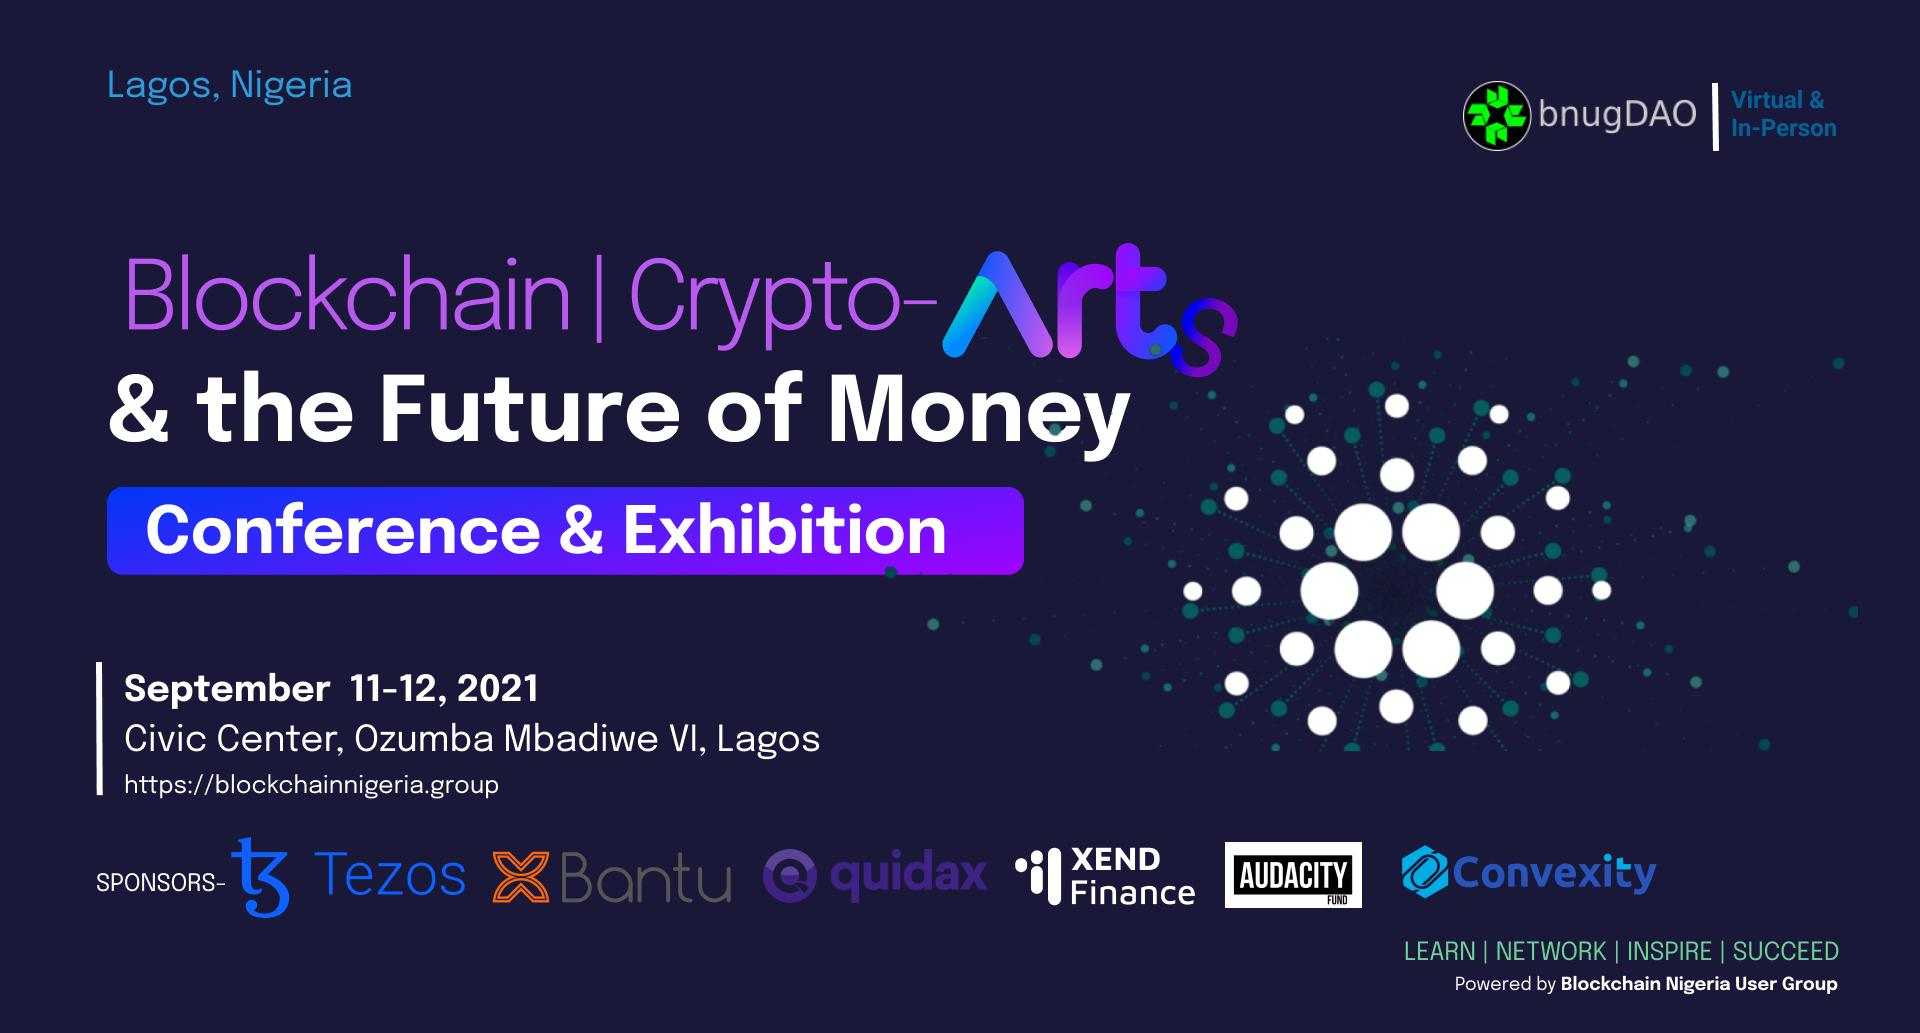 Lagos Blockchain & Crypto Conference